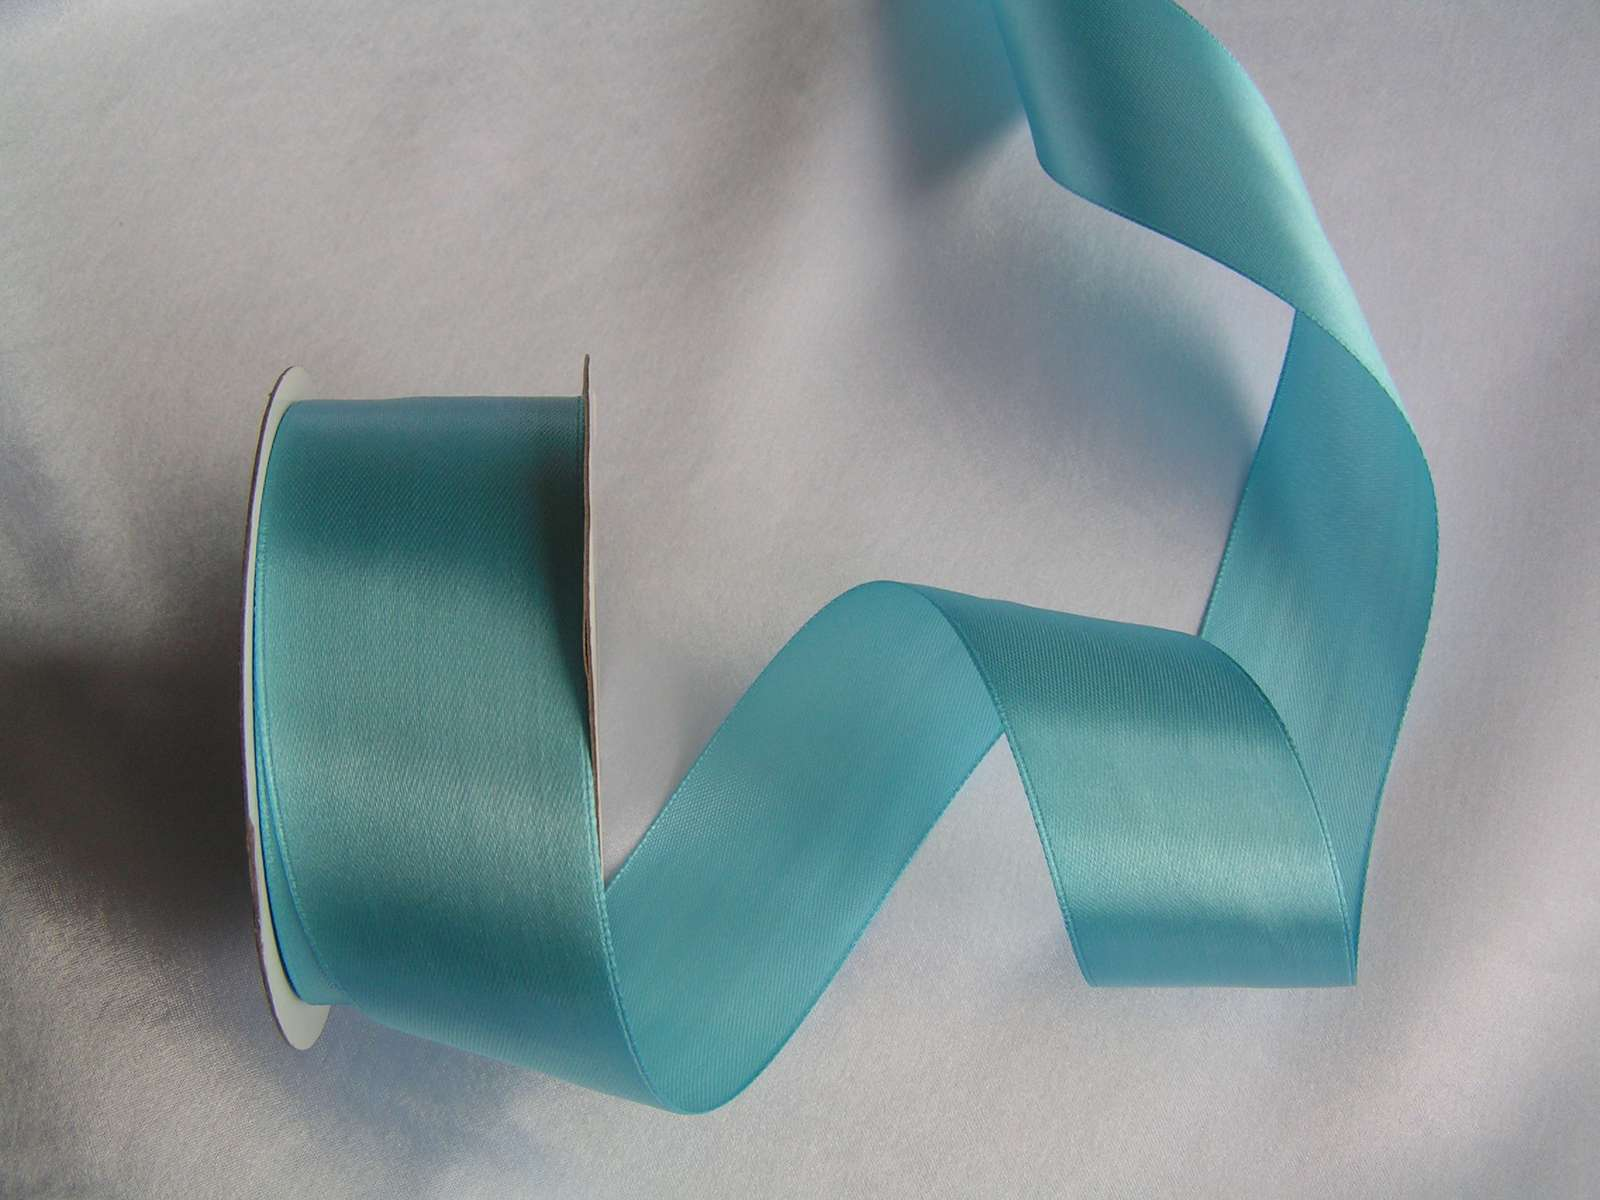 Modrá saténová stuha 40 mm - Obrázek č. 1